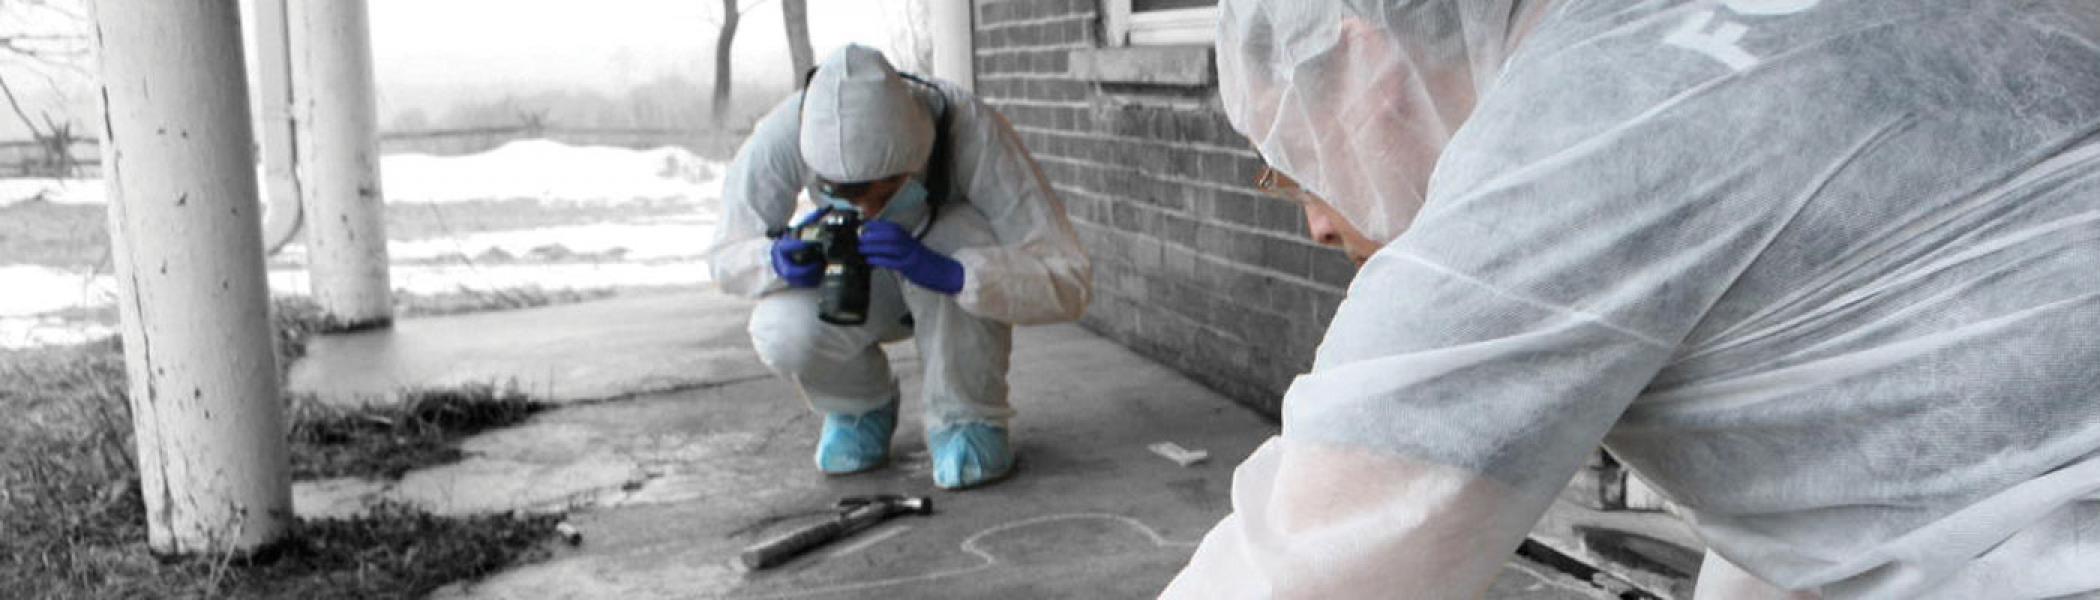 Students investigating a stimulated crime scene